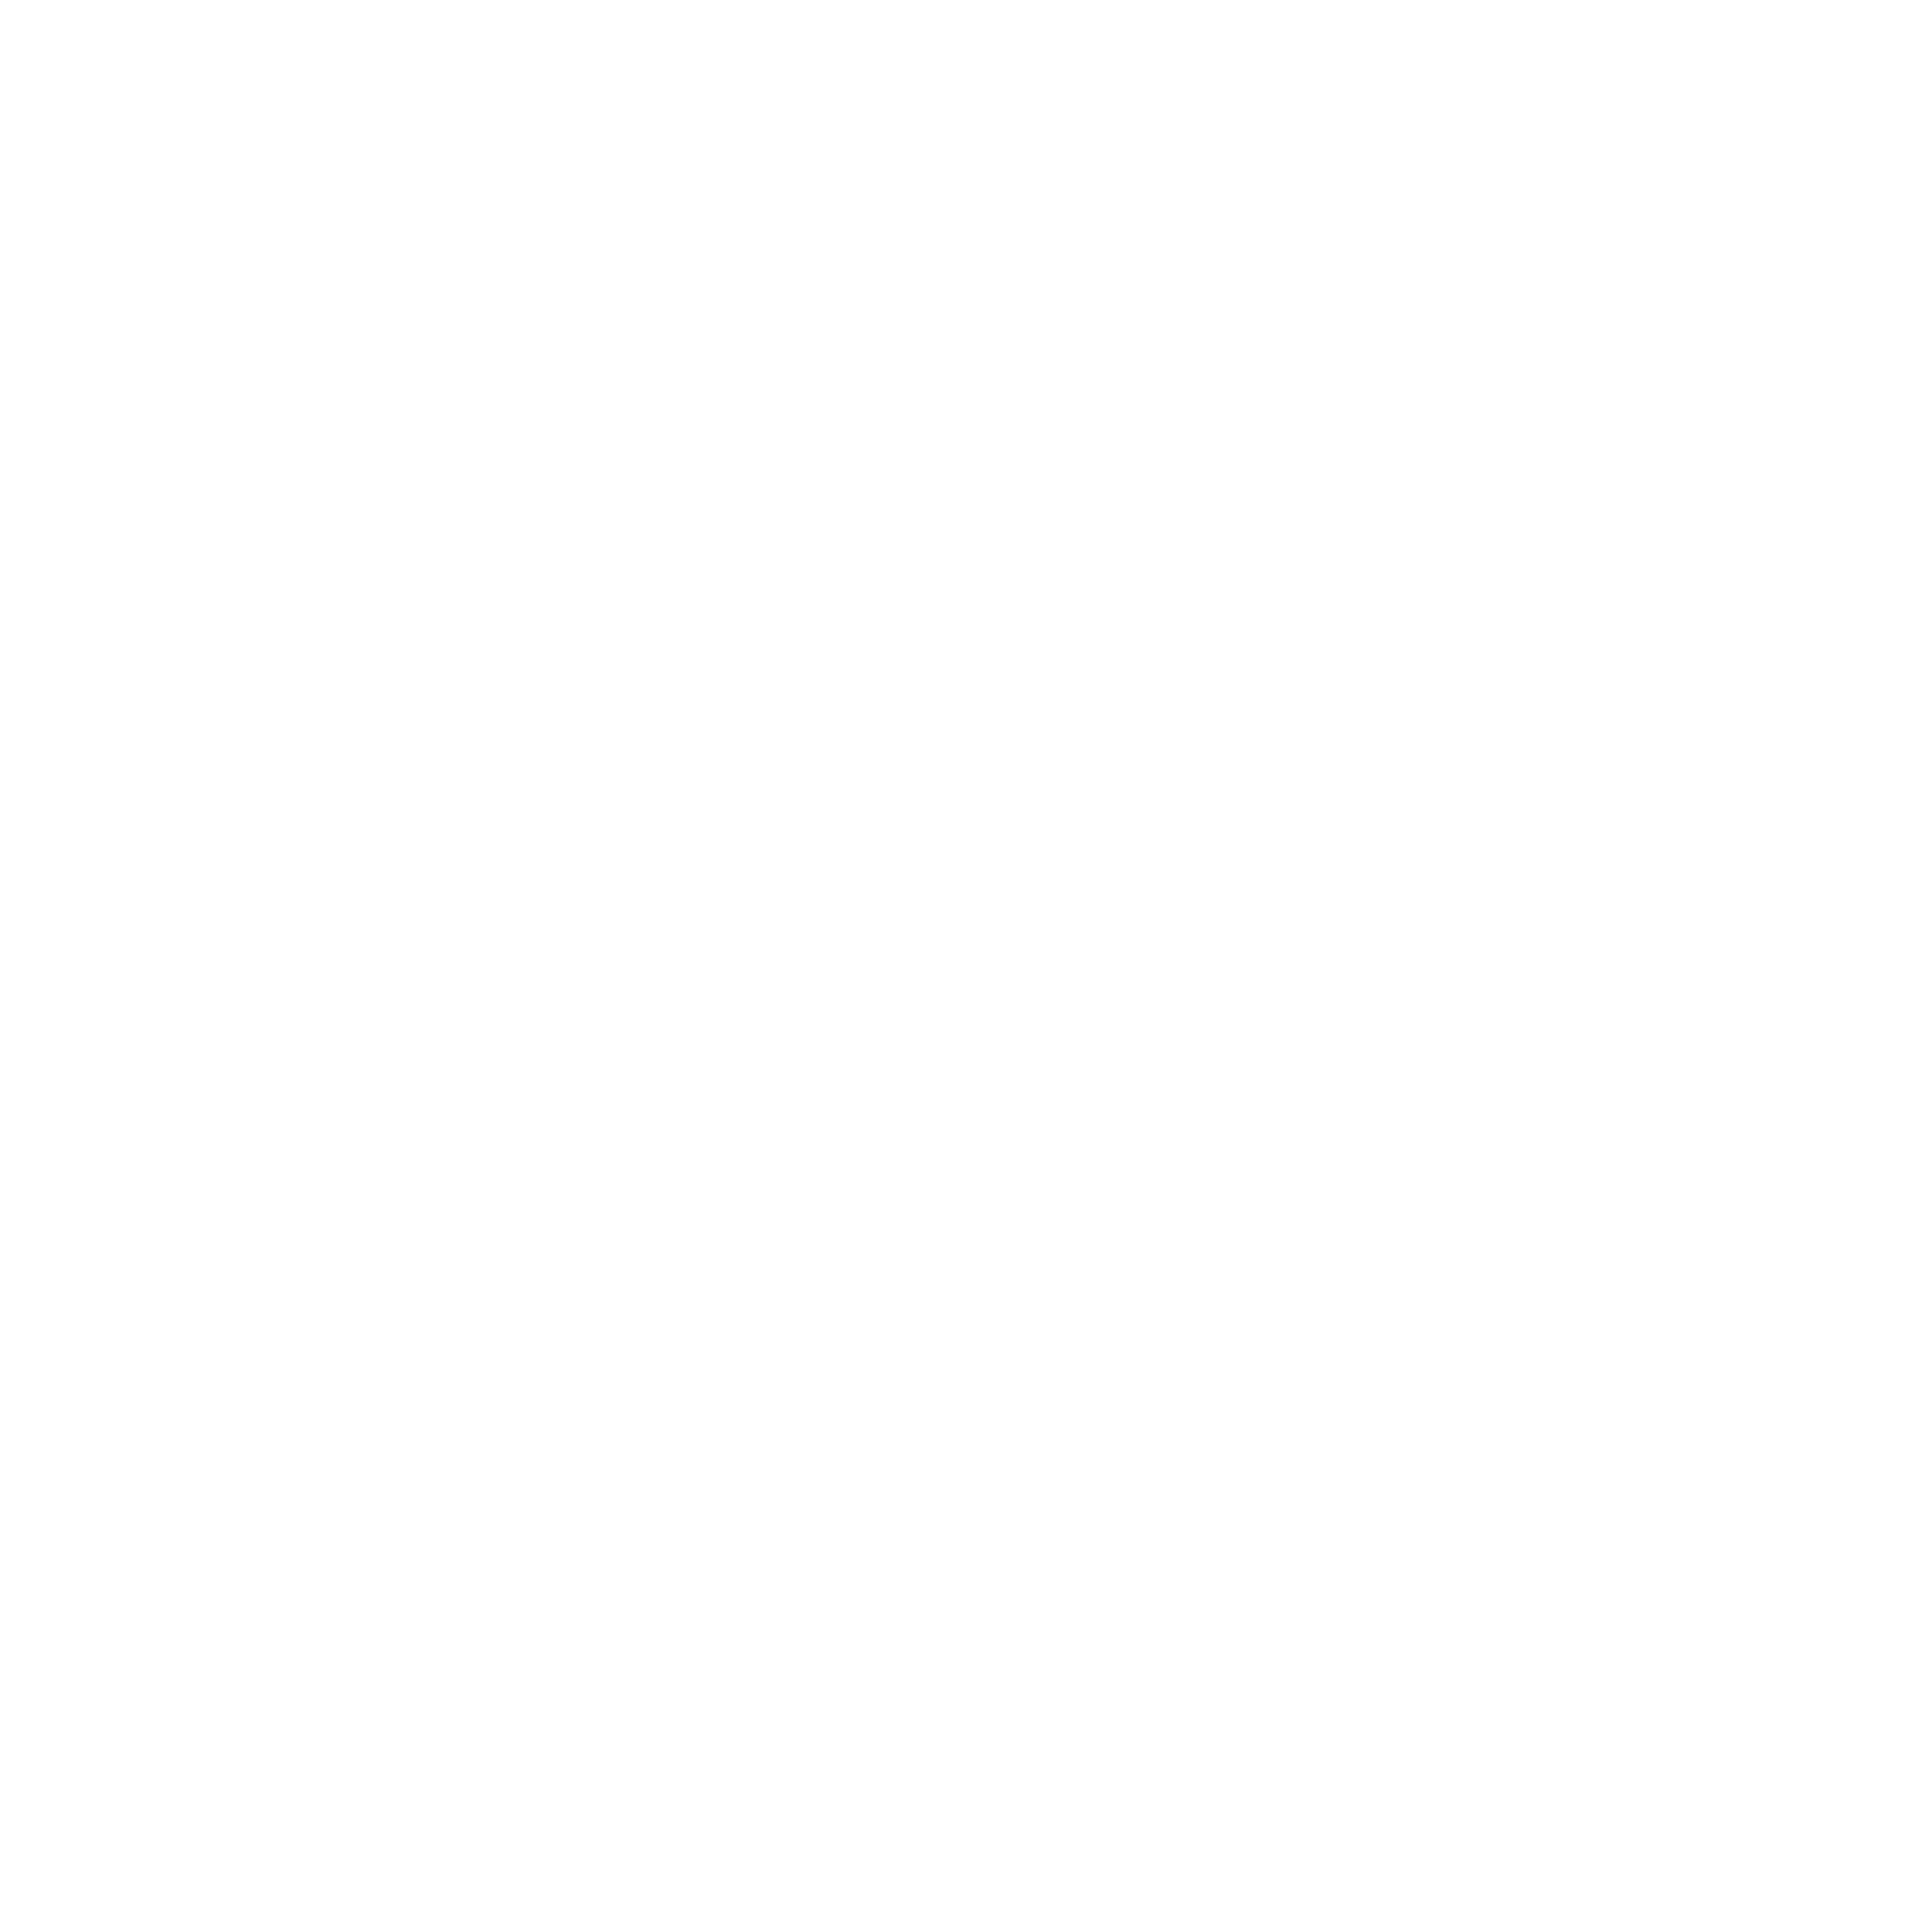 Max8白底logo